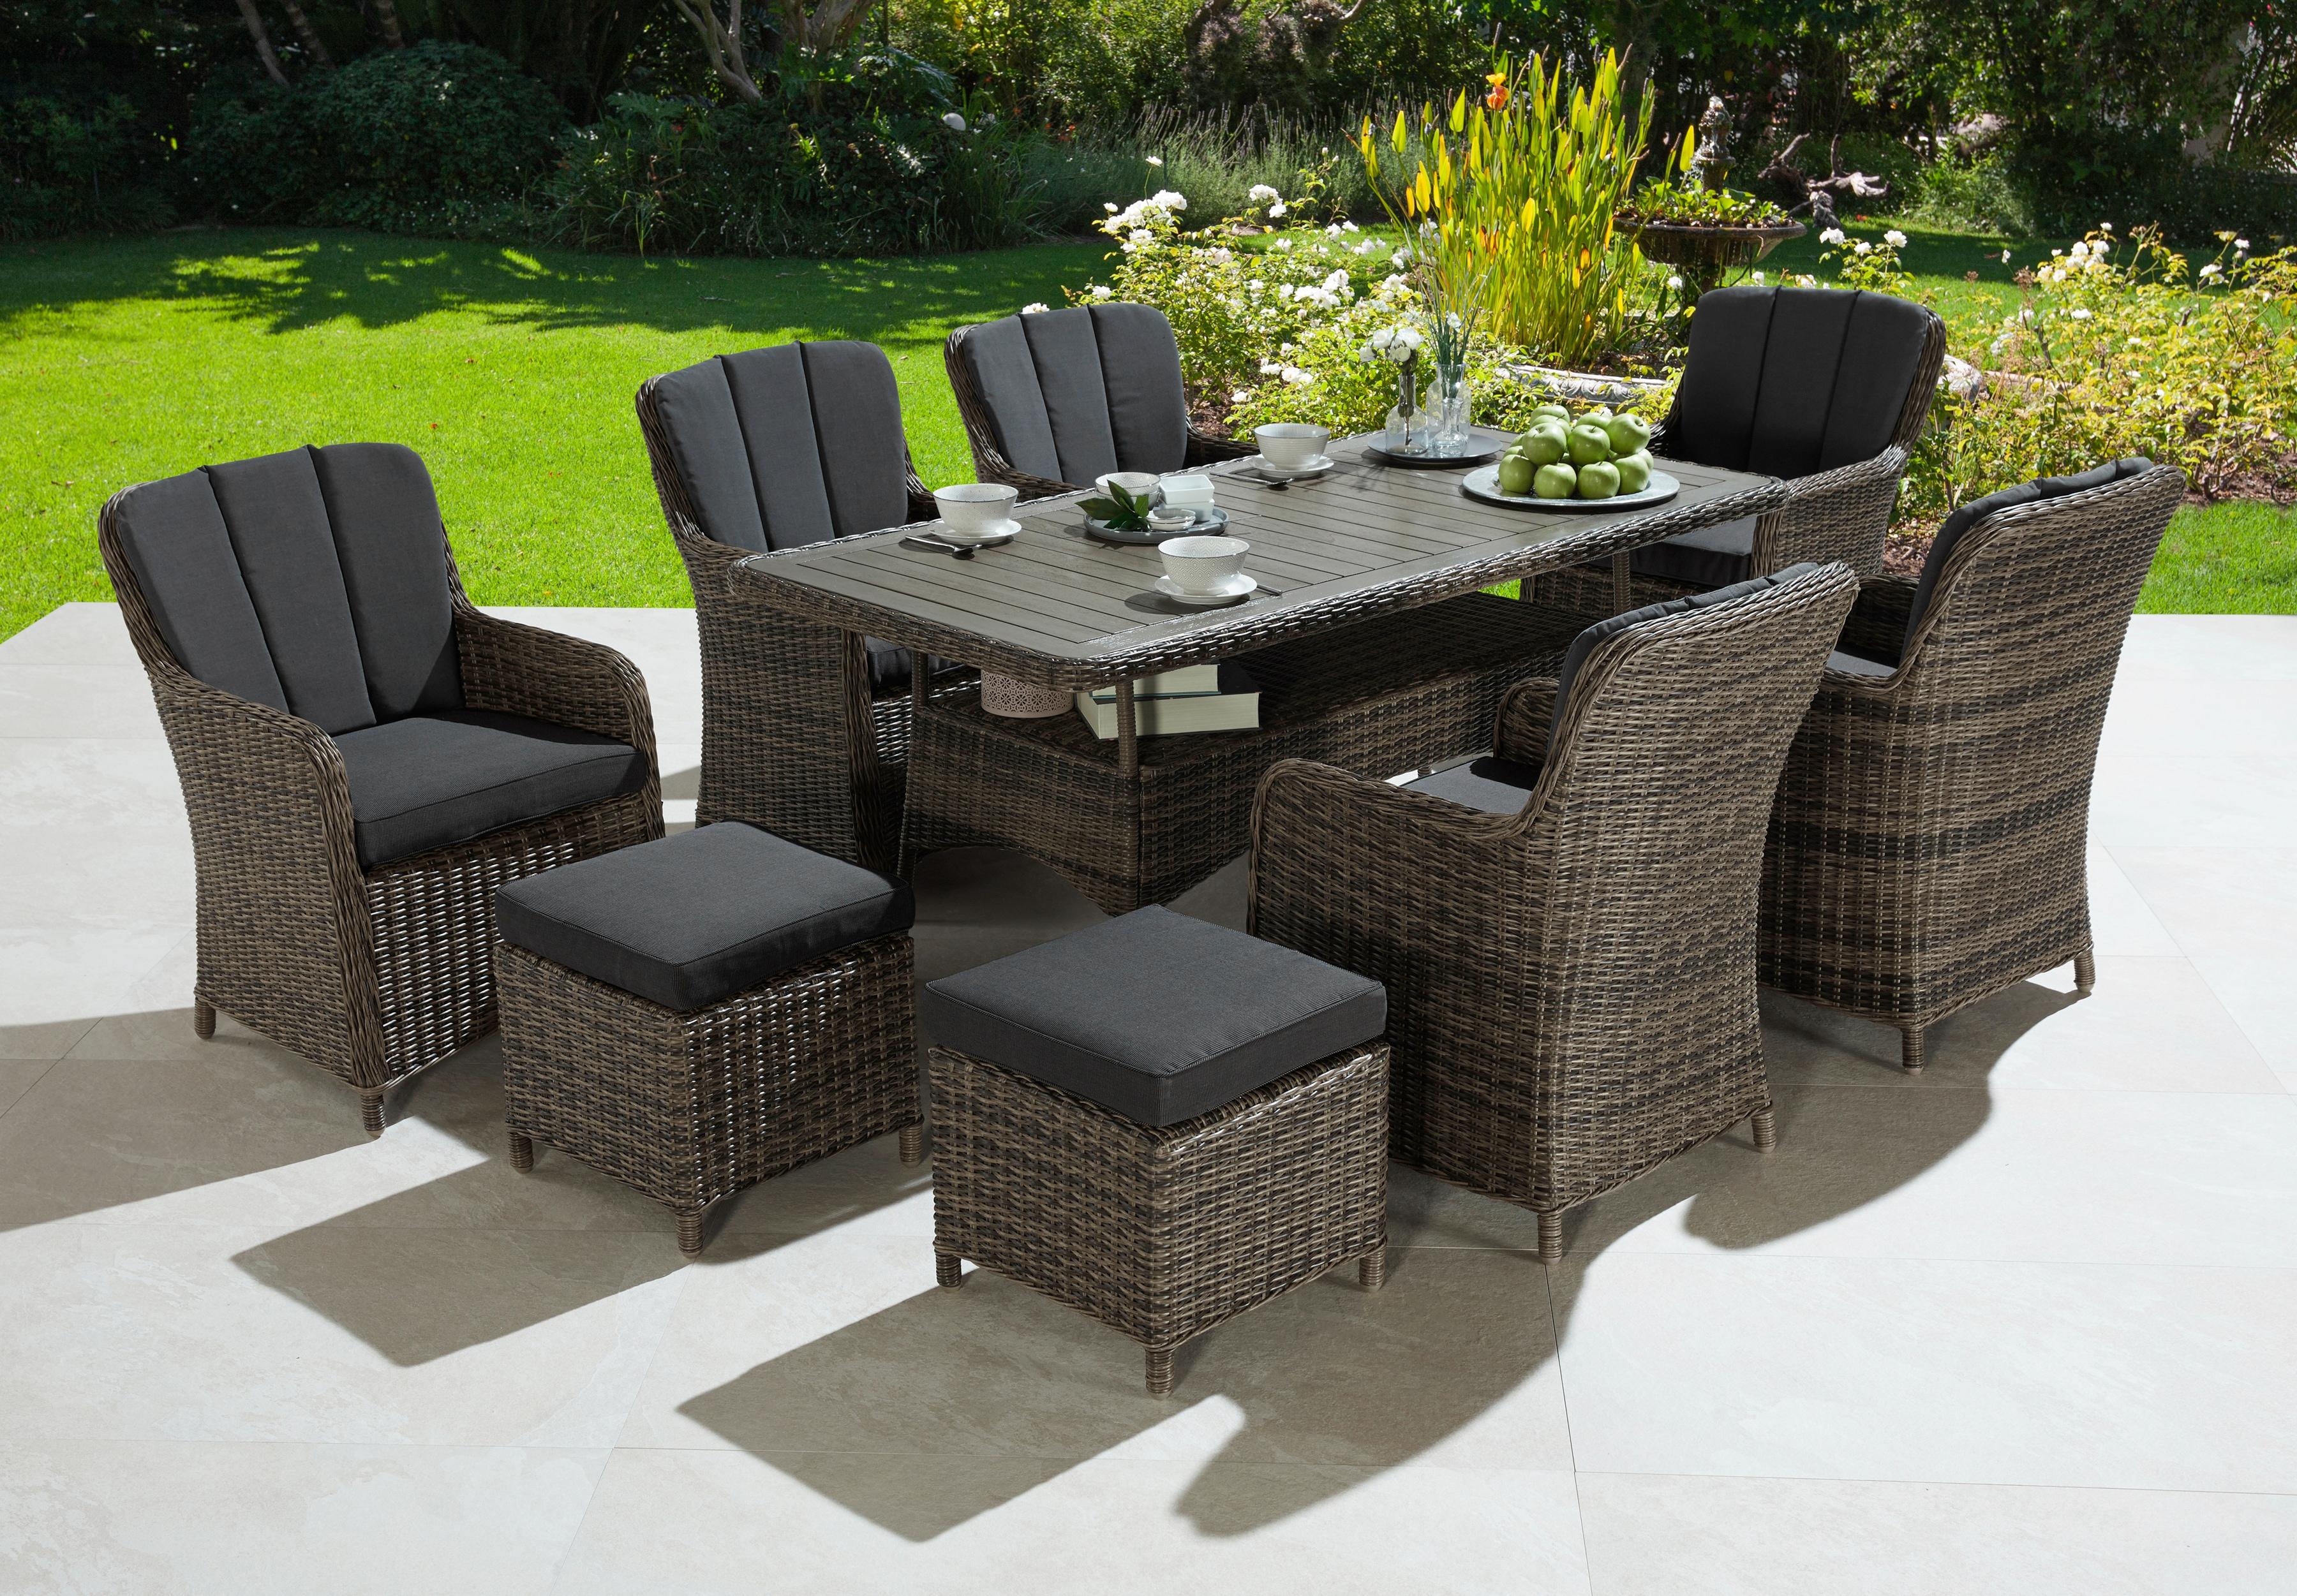 KONIFERA Gartenmöbelset Kenya 23-tlg 6 Sessel 2 Hocker Tisch Polyrattan/Akazie